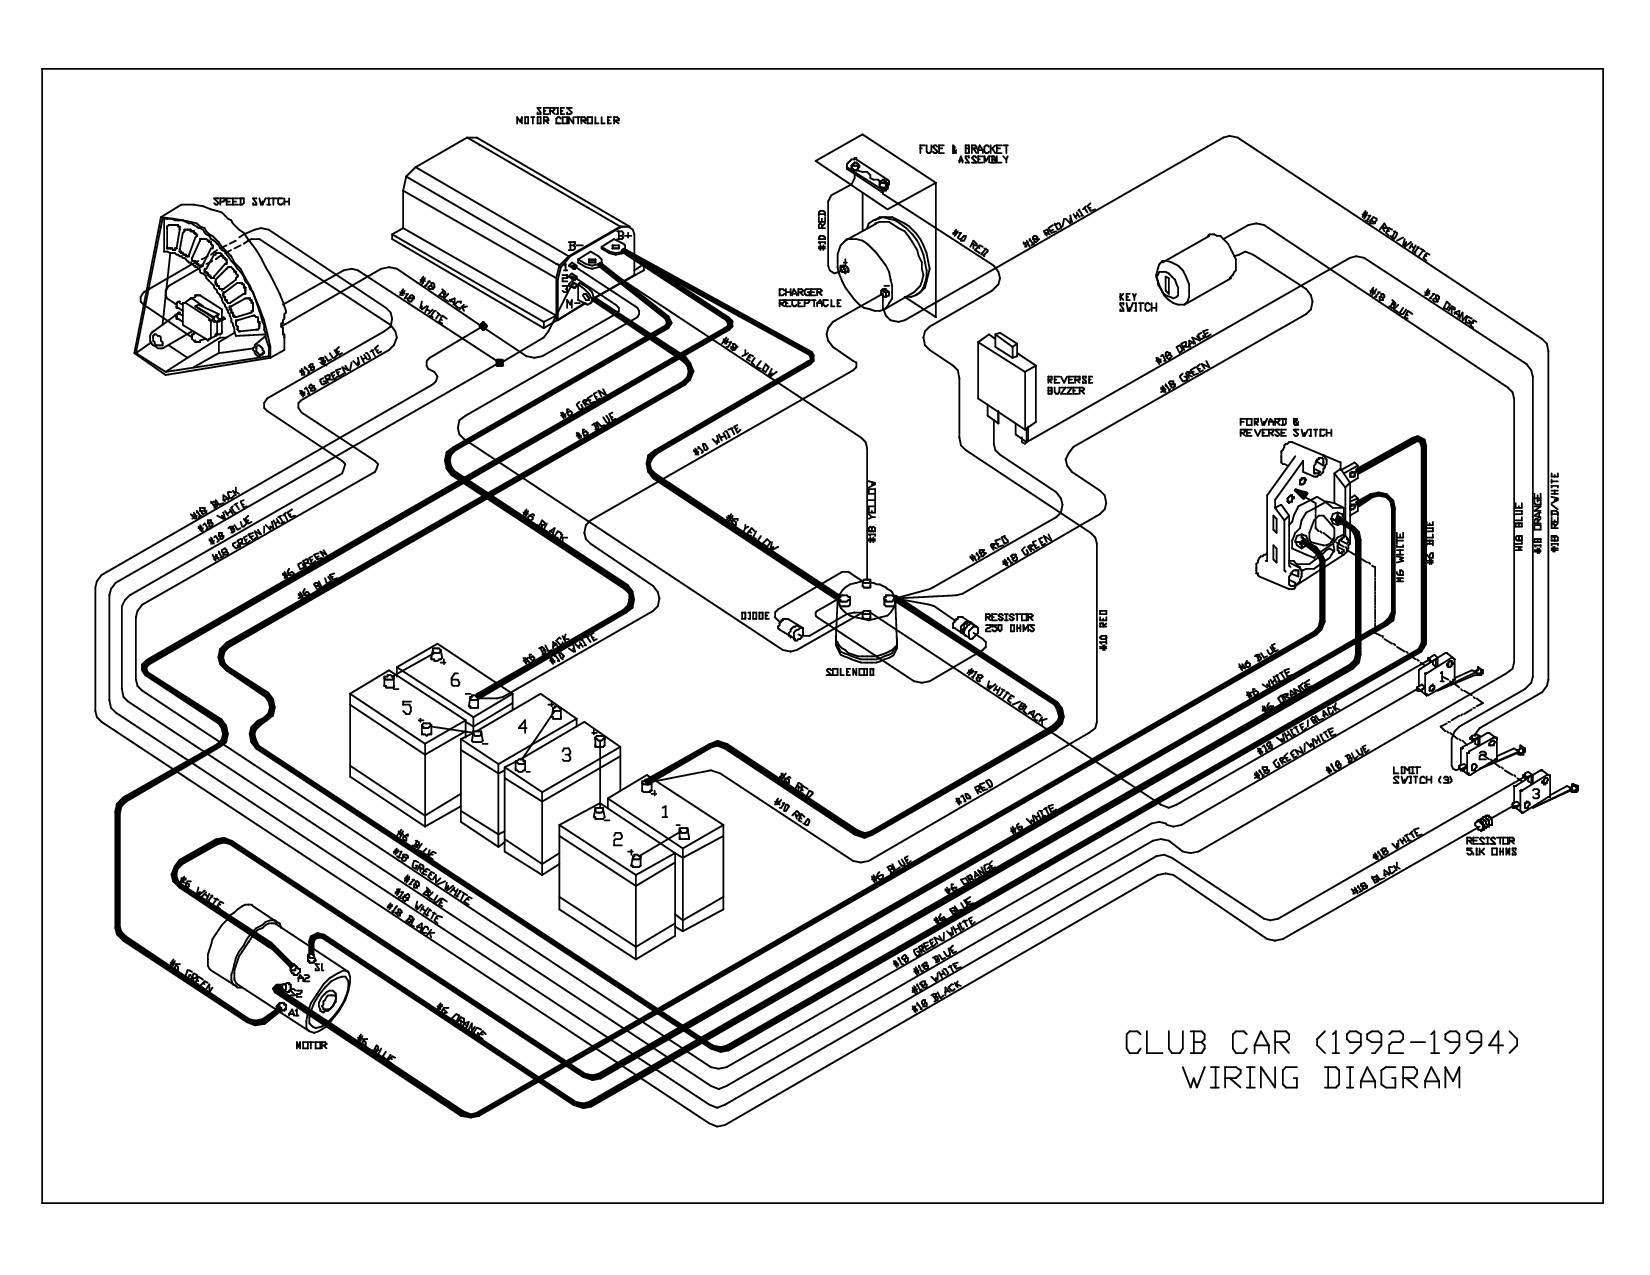 Diagram forward Reverse Switch 2007 Club Golf Cart Club Car Ds Golf Cart Wiring Diagram Wiring Diagram Data Of Diagram forward Reverse Switch 2007 Club Golf Cart